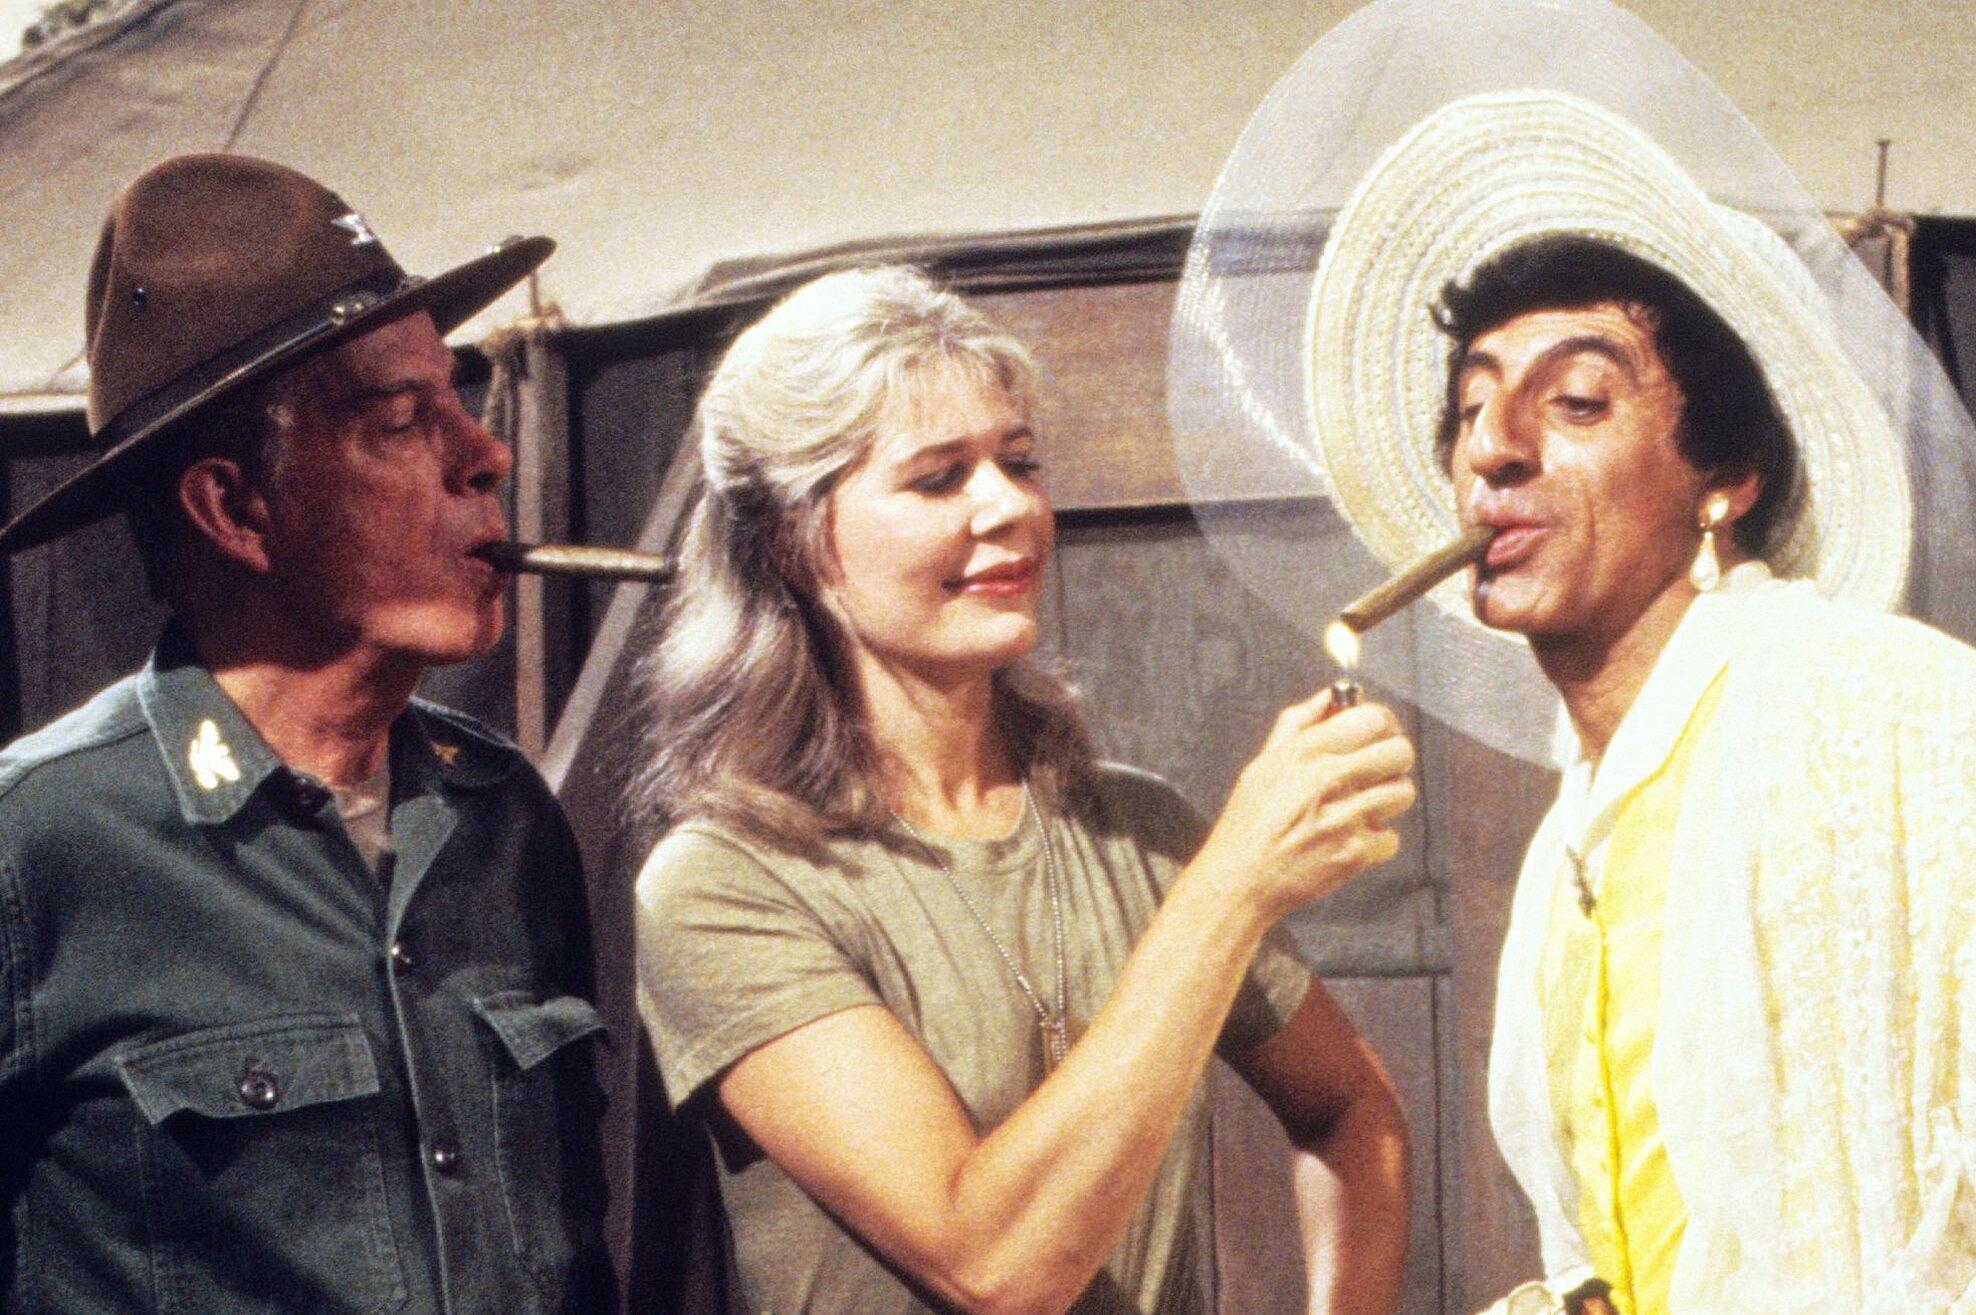 MASH stars Jamie Farr, Loretta Swit reunite 35 years after the final episode   EW.com